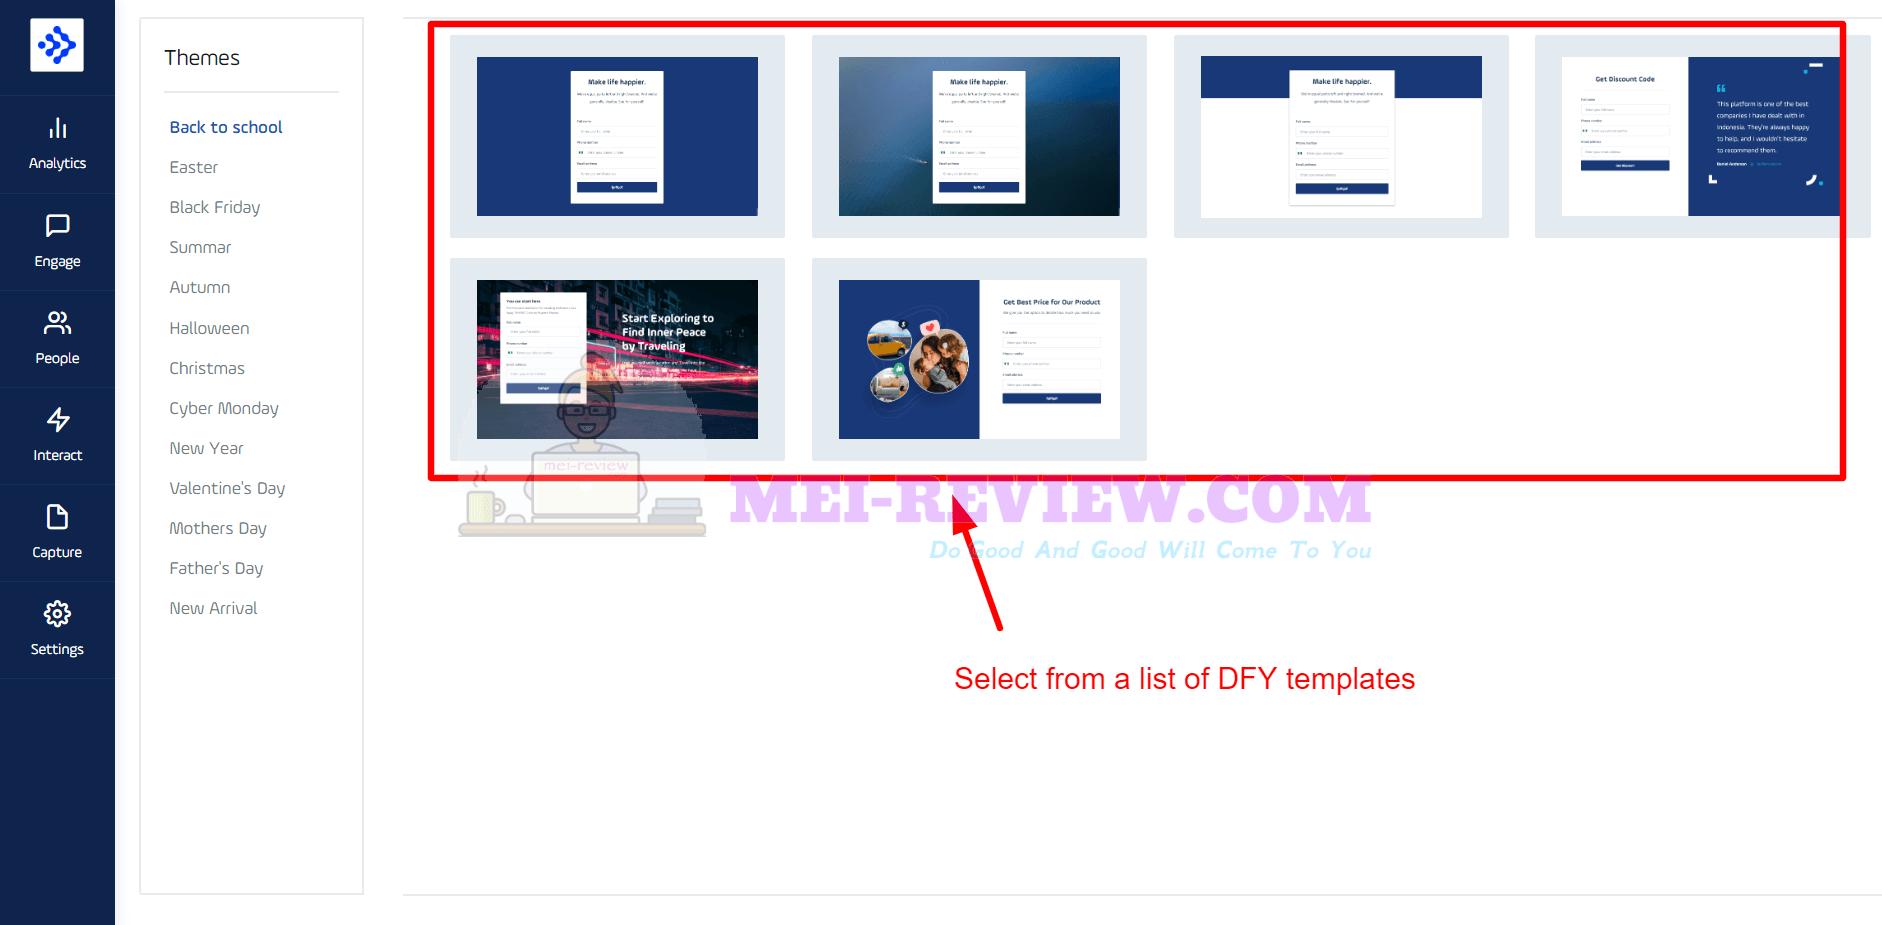 tagget-demo-11-DFY-templates